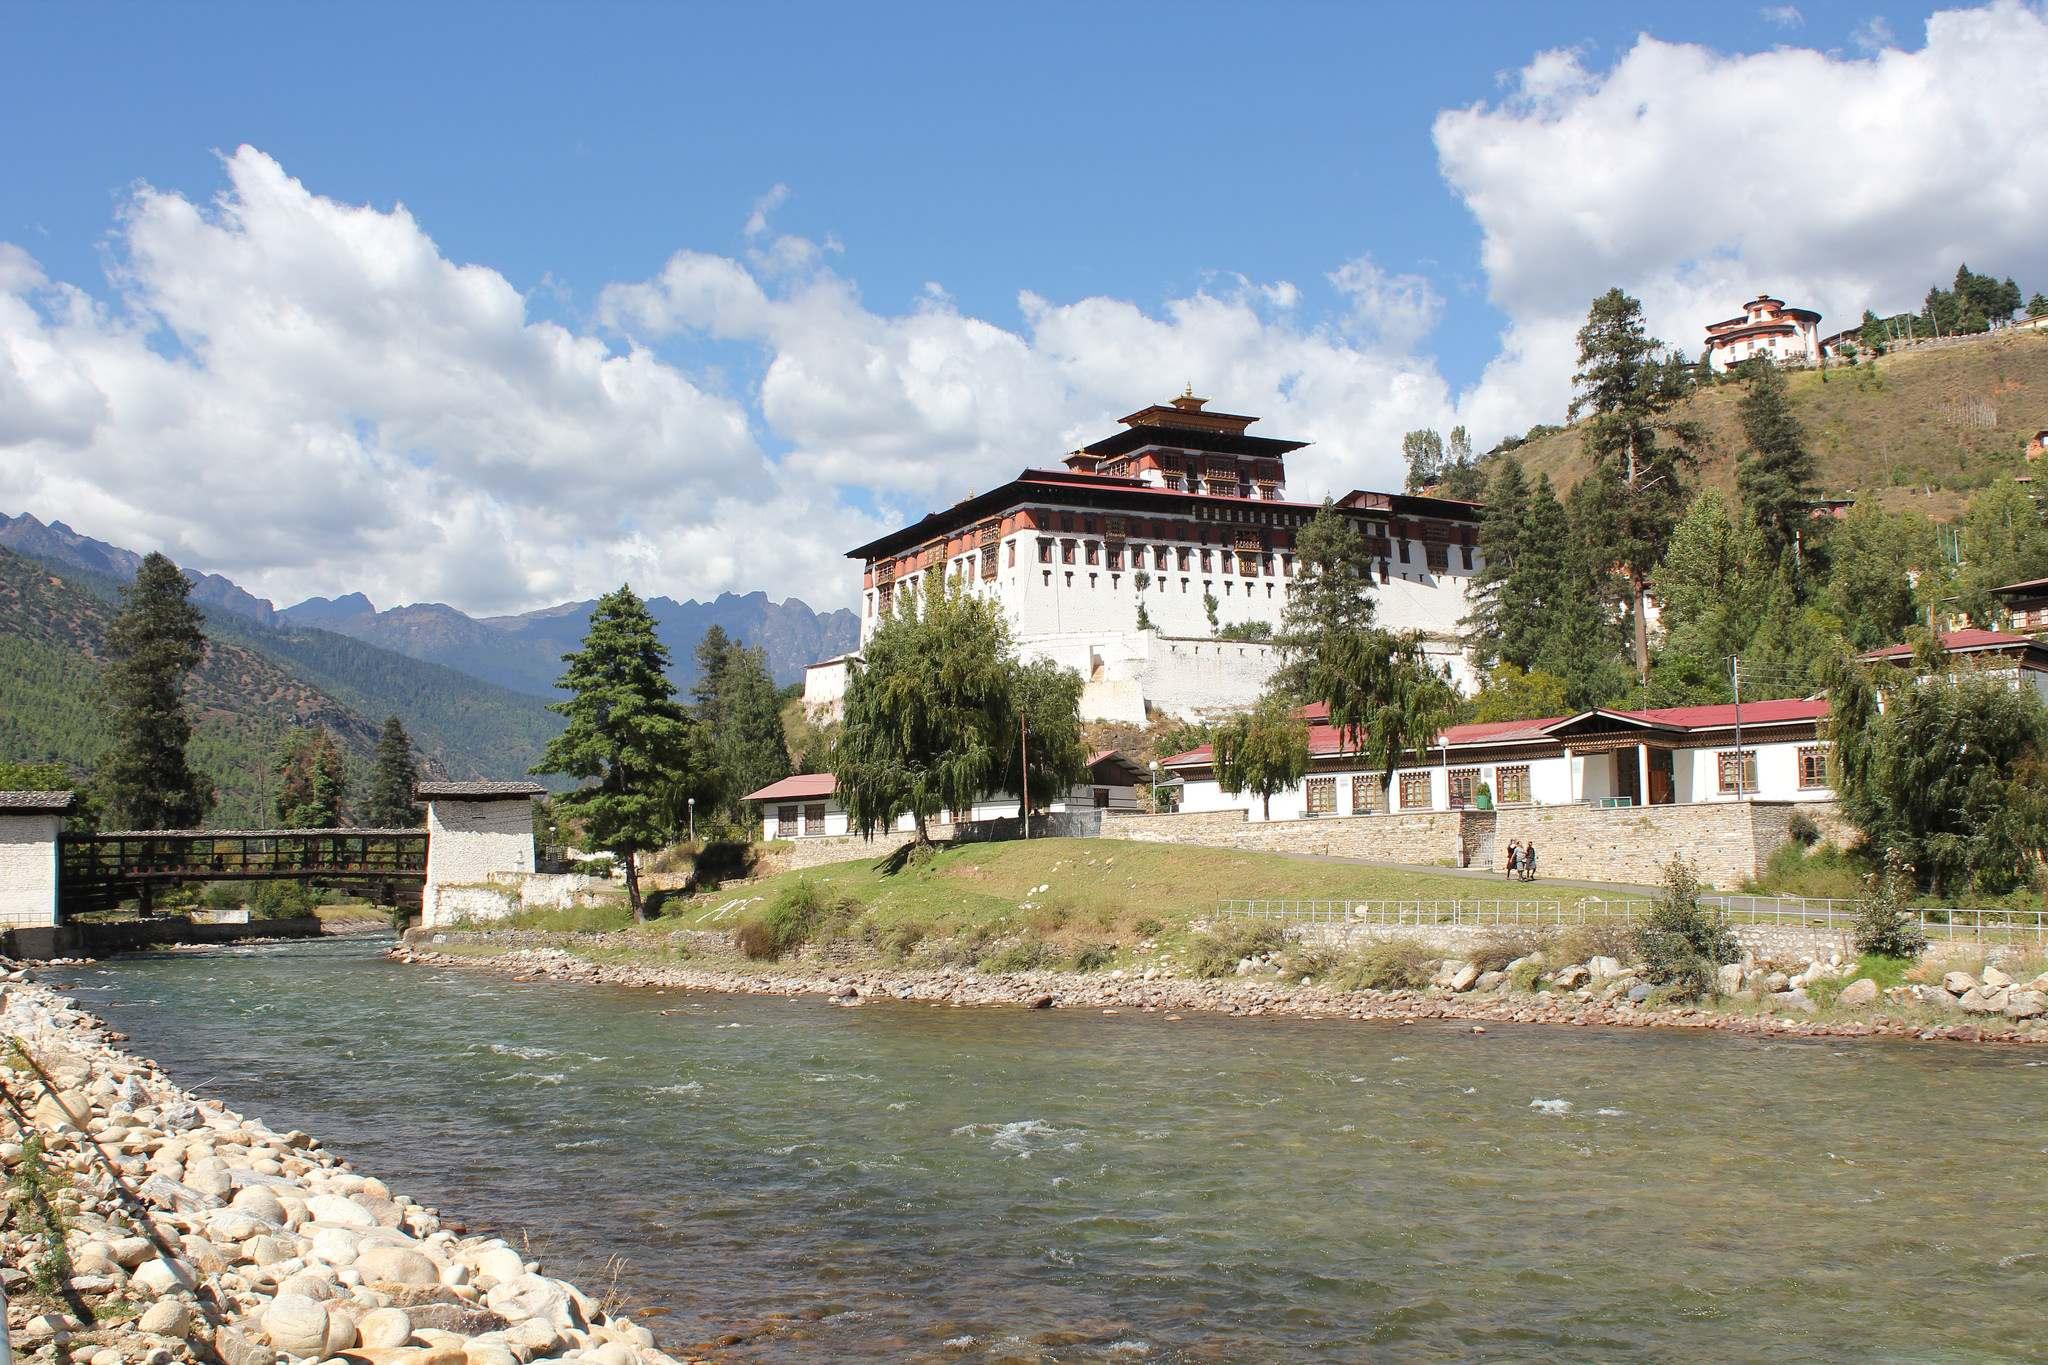 bhutan5 Bhutan   The Land of the Thunder Dragon